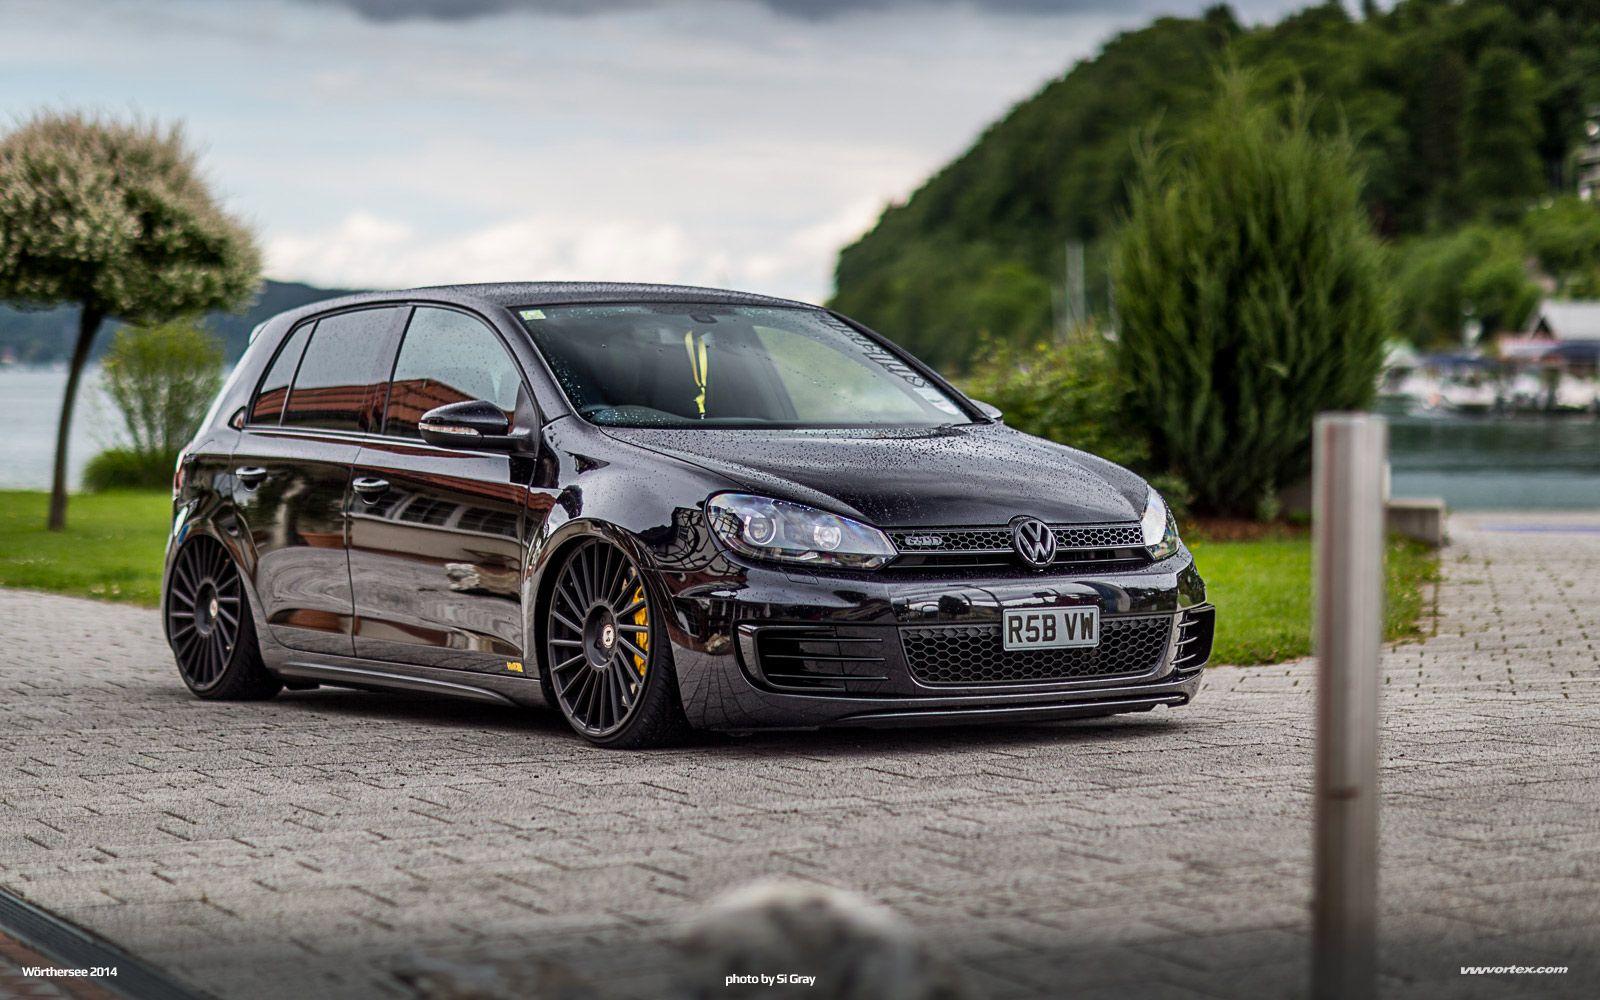 Pin By Katlego Matabane On Vw Vw Golf Gt Volkswagen